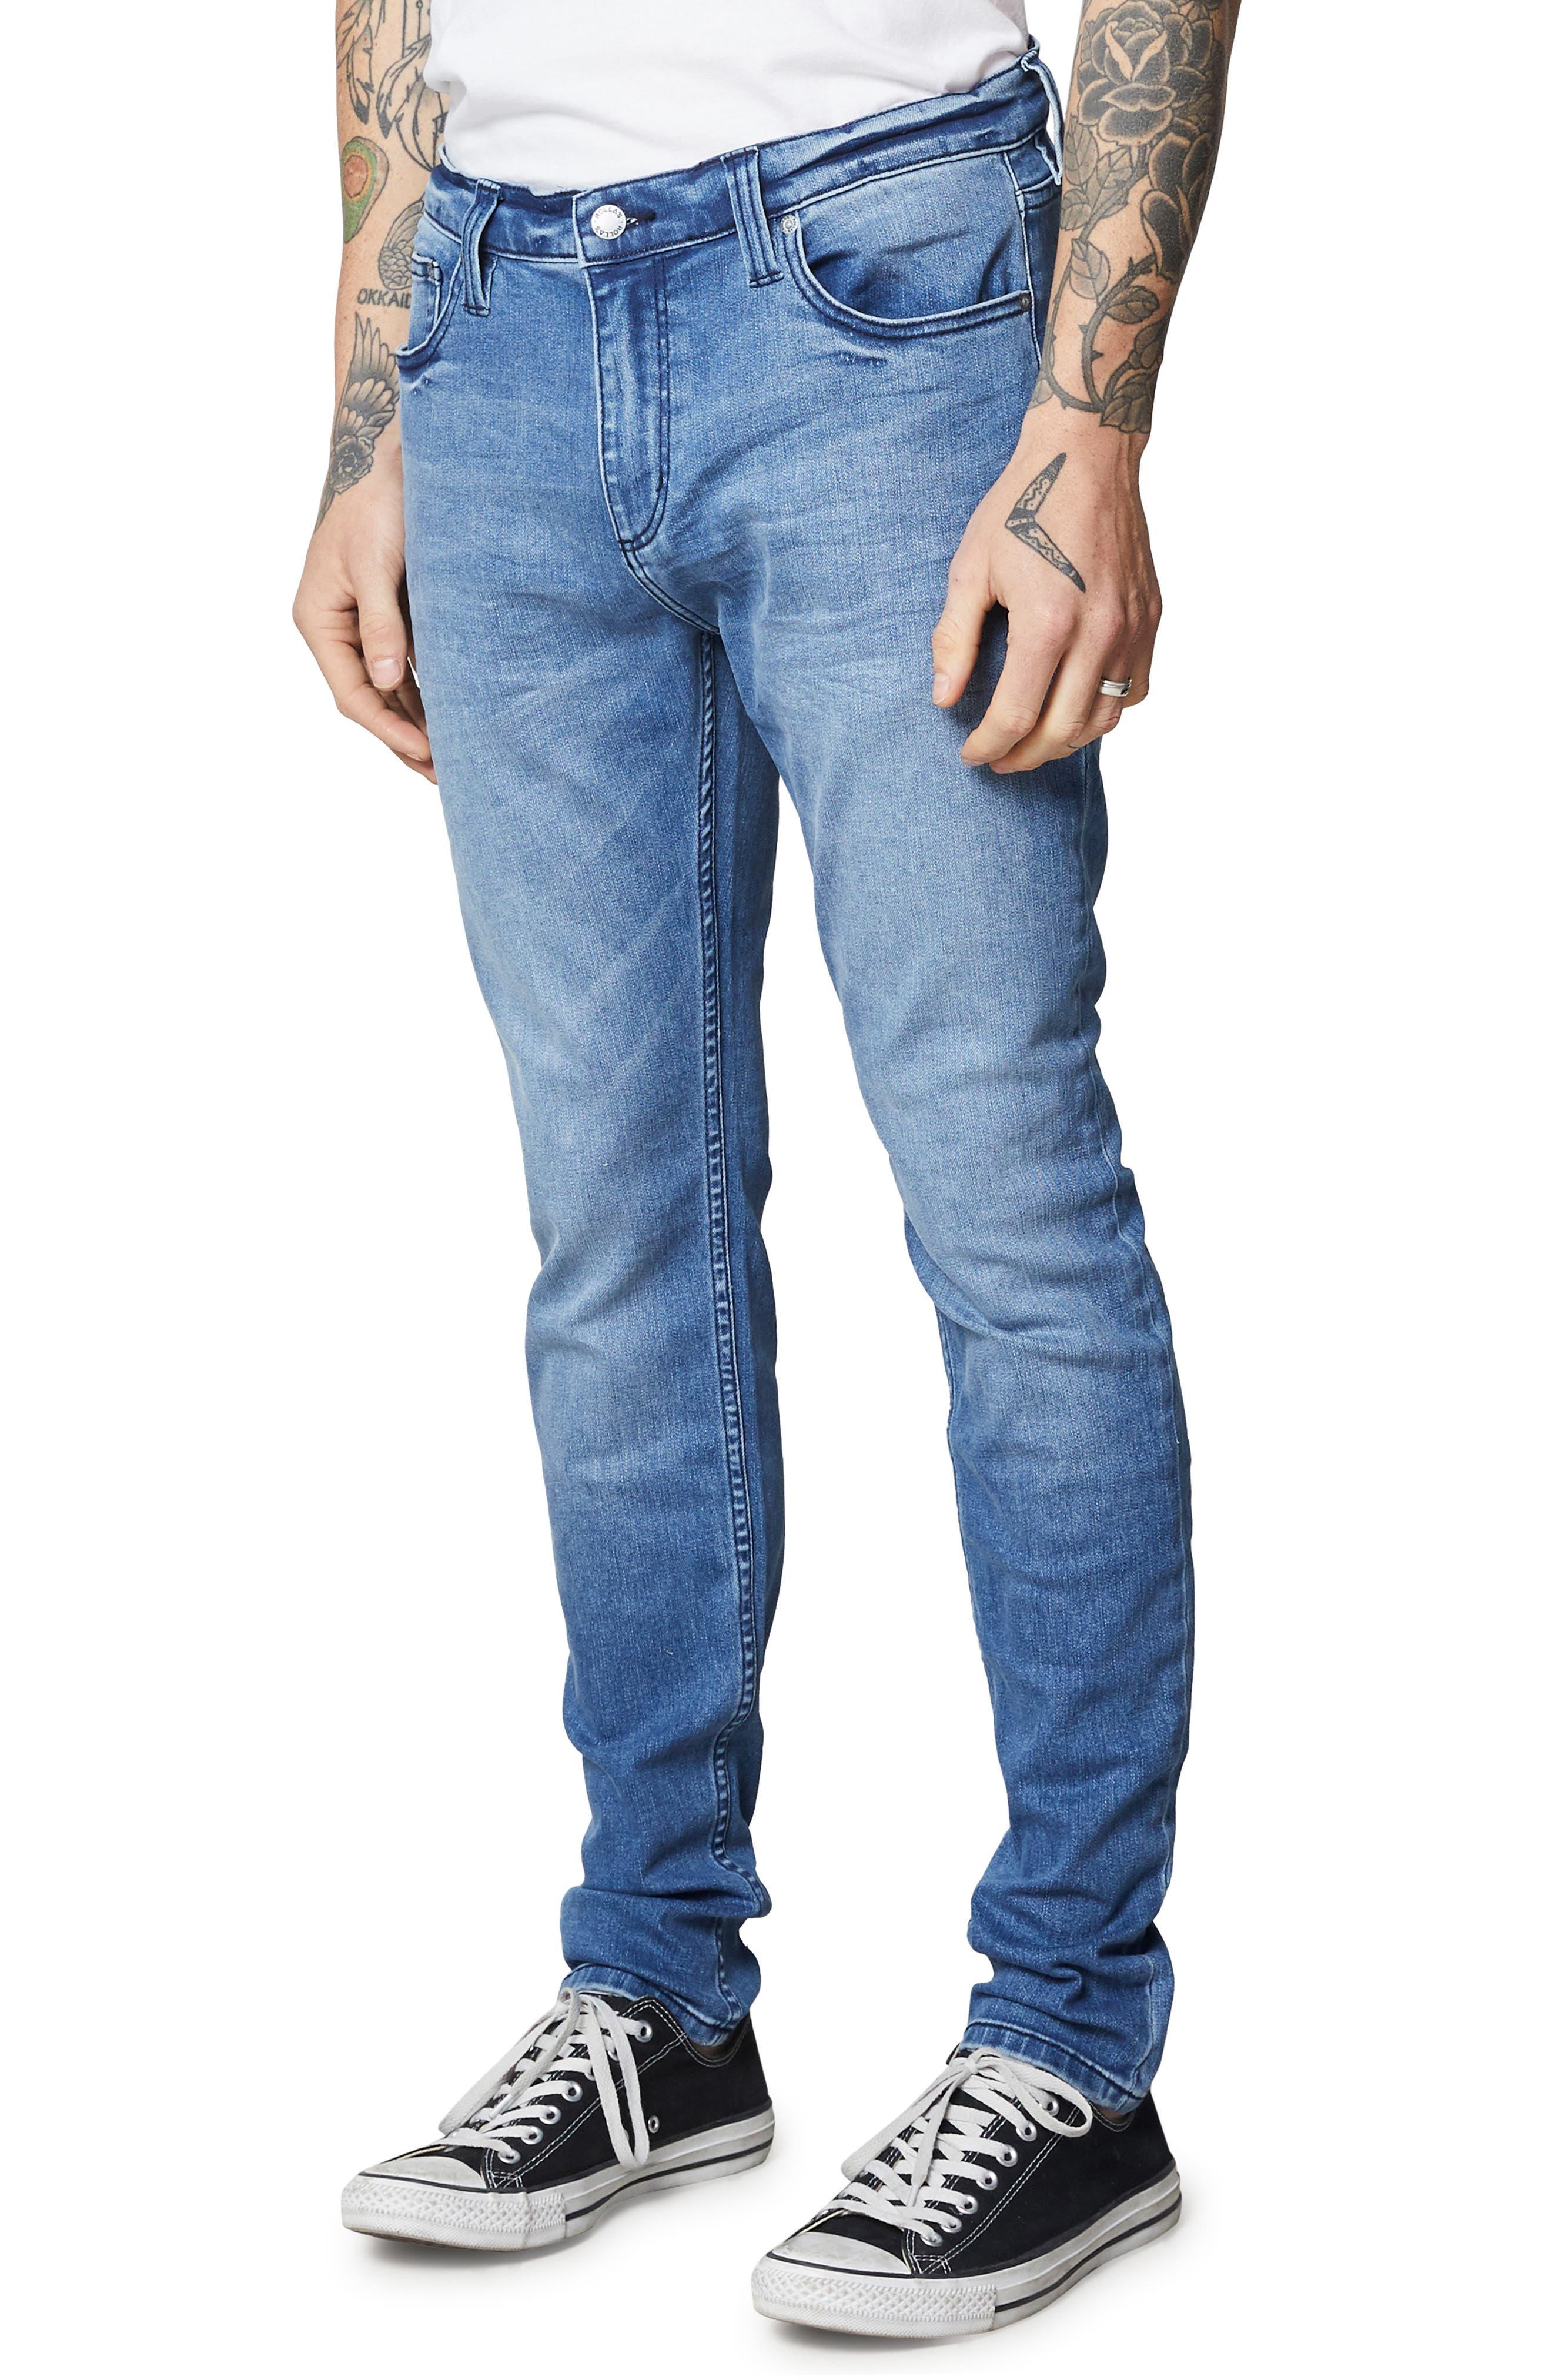 Stinger Skinny Fit Jeans,                             Alternate thumbnail 3, color,                             TRUE BLUE